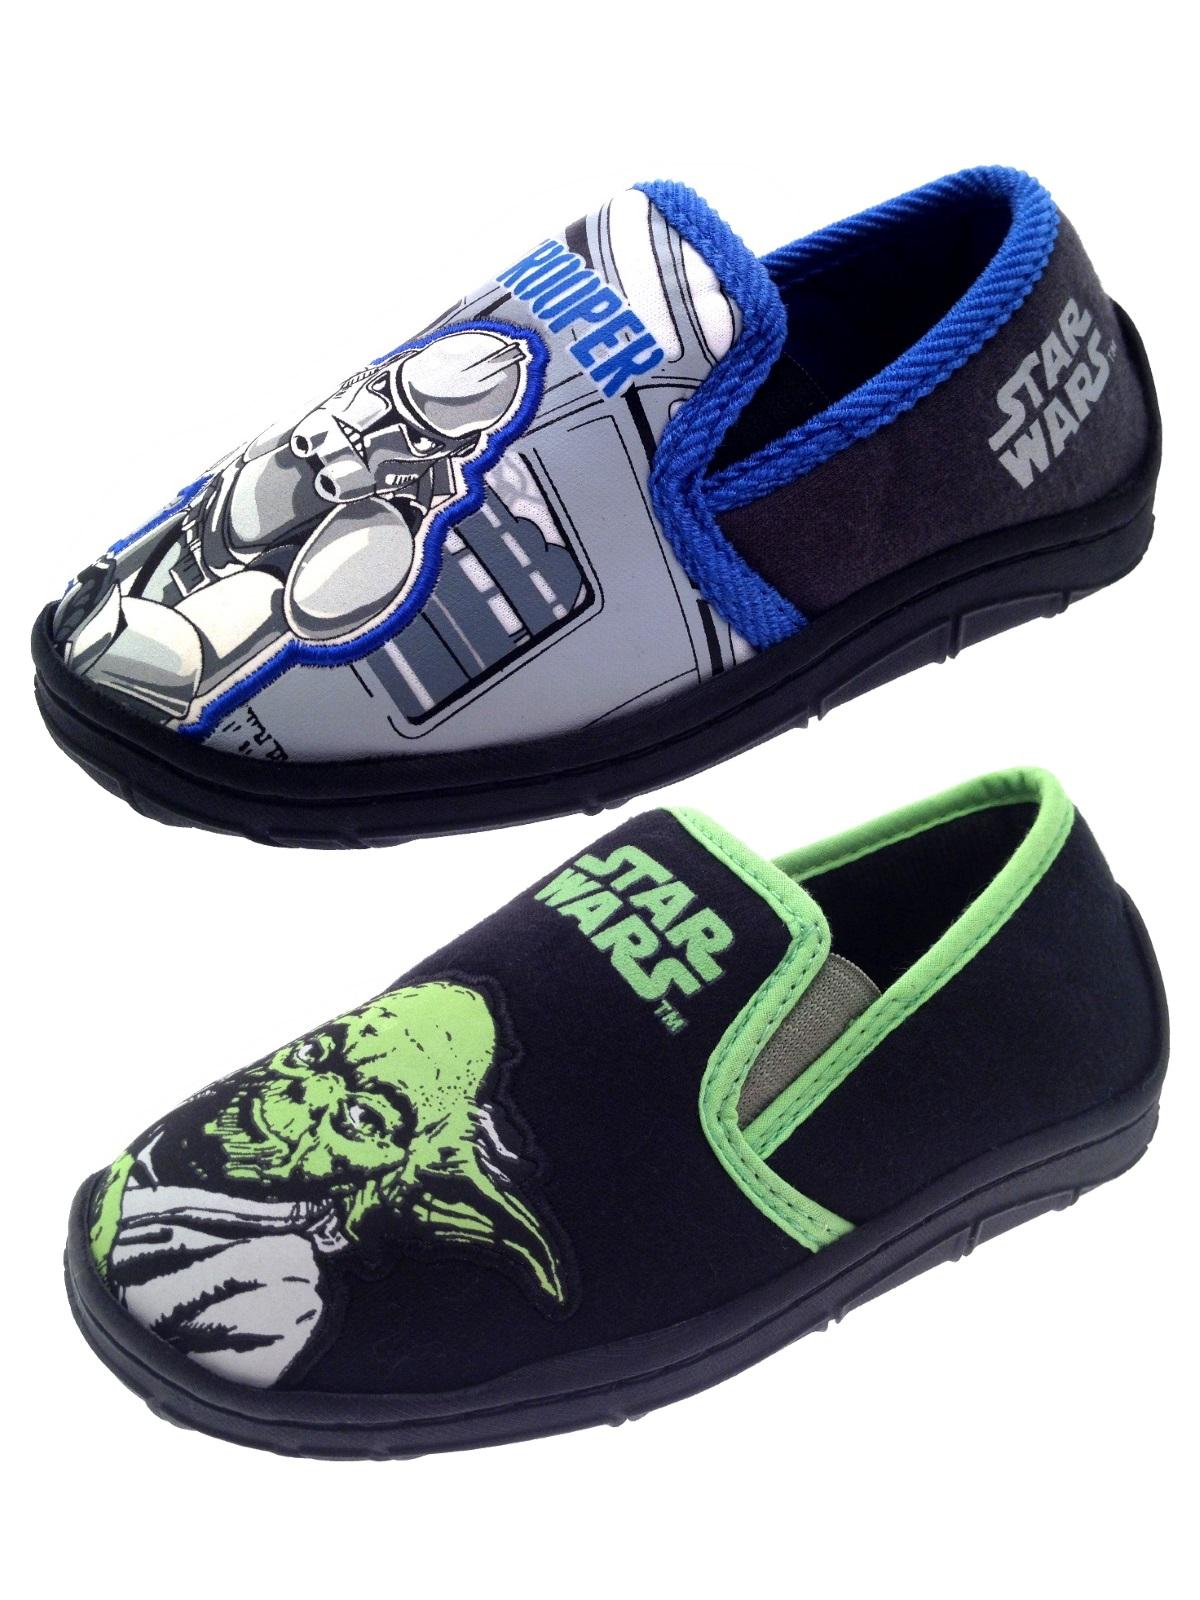 Boys Disney Star Wars Slippers Slip On